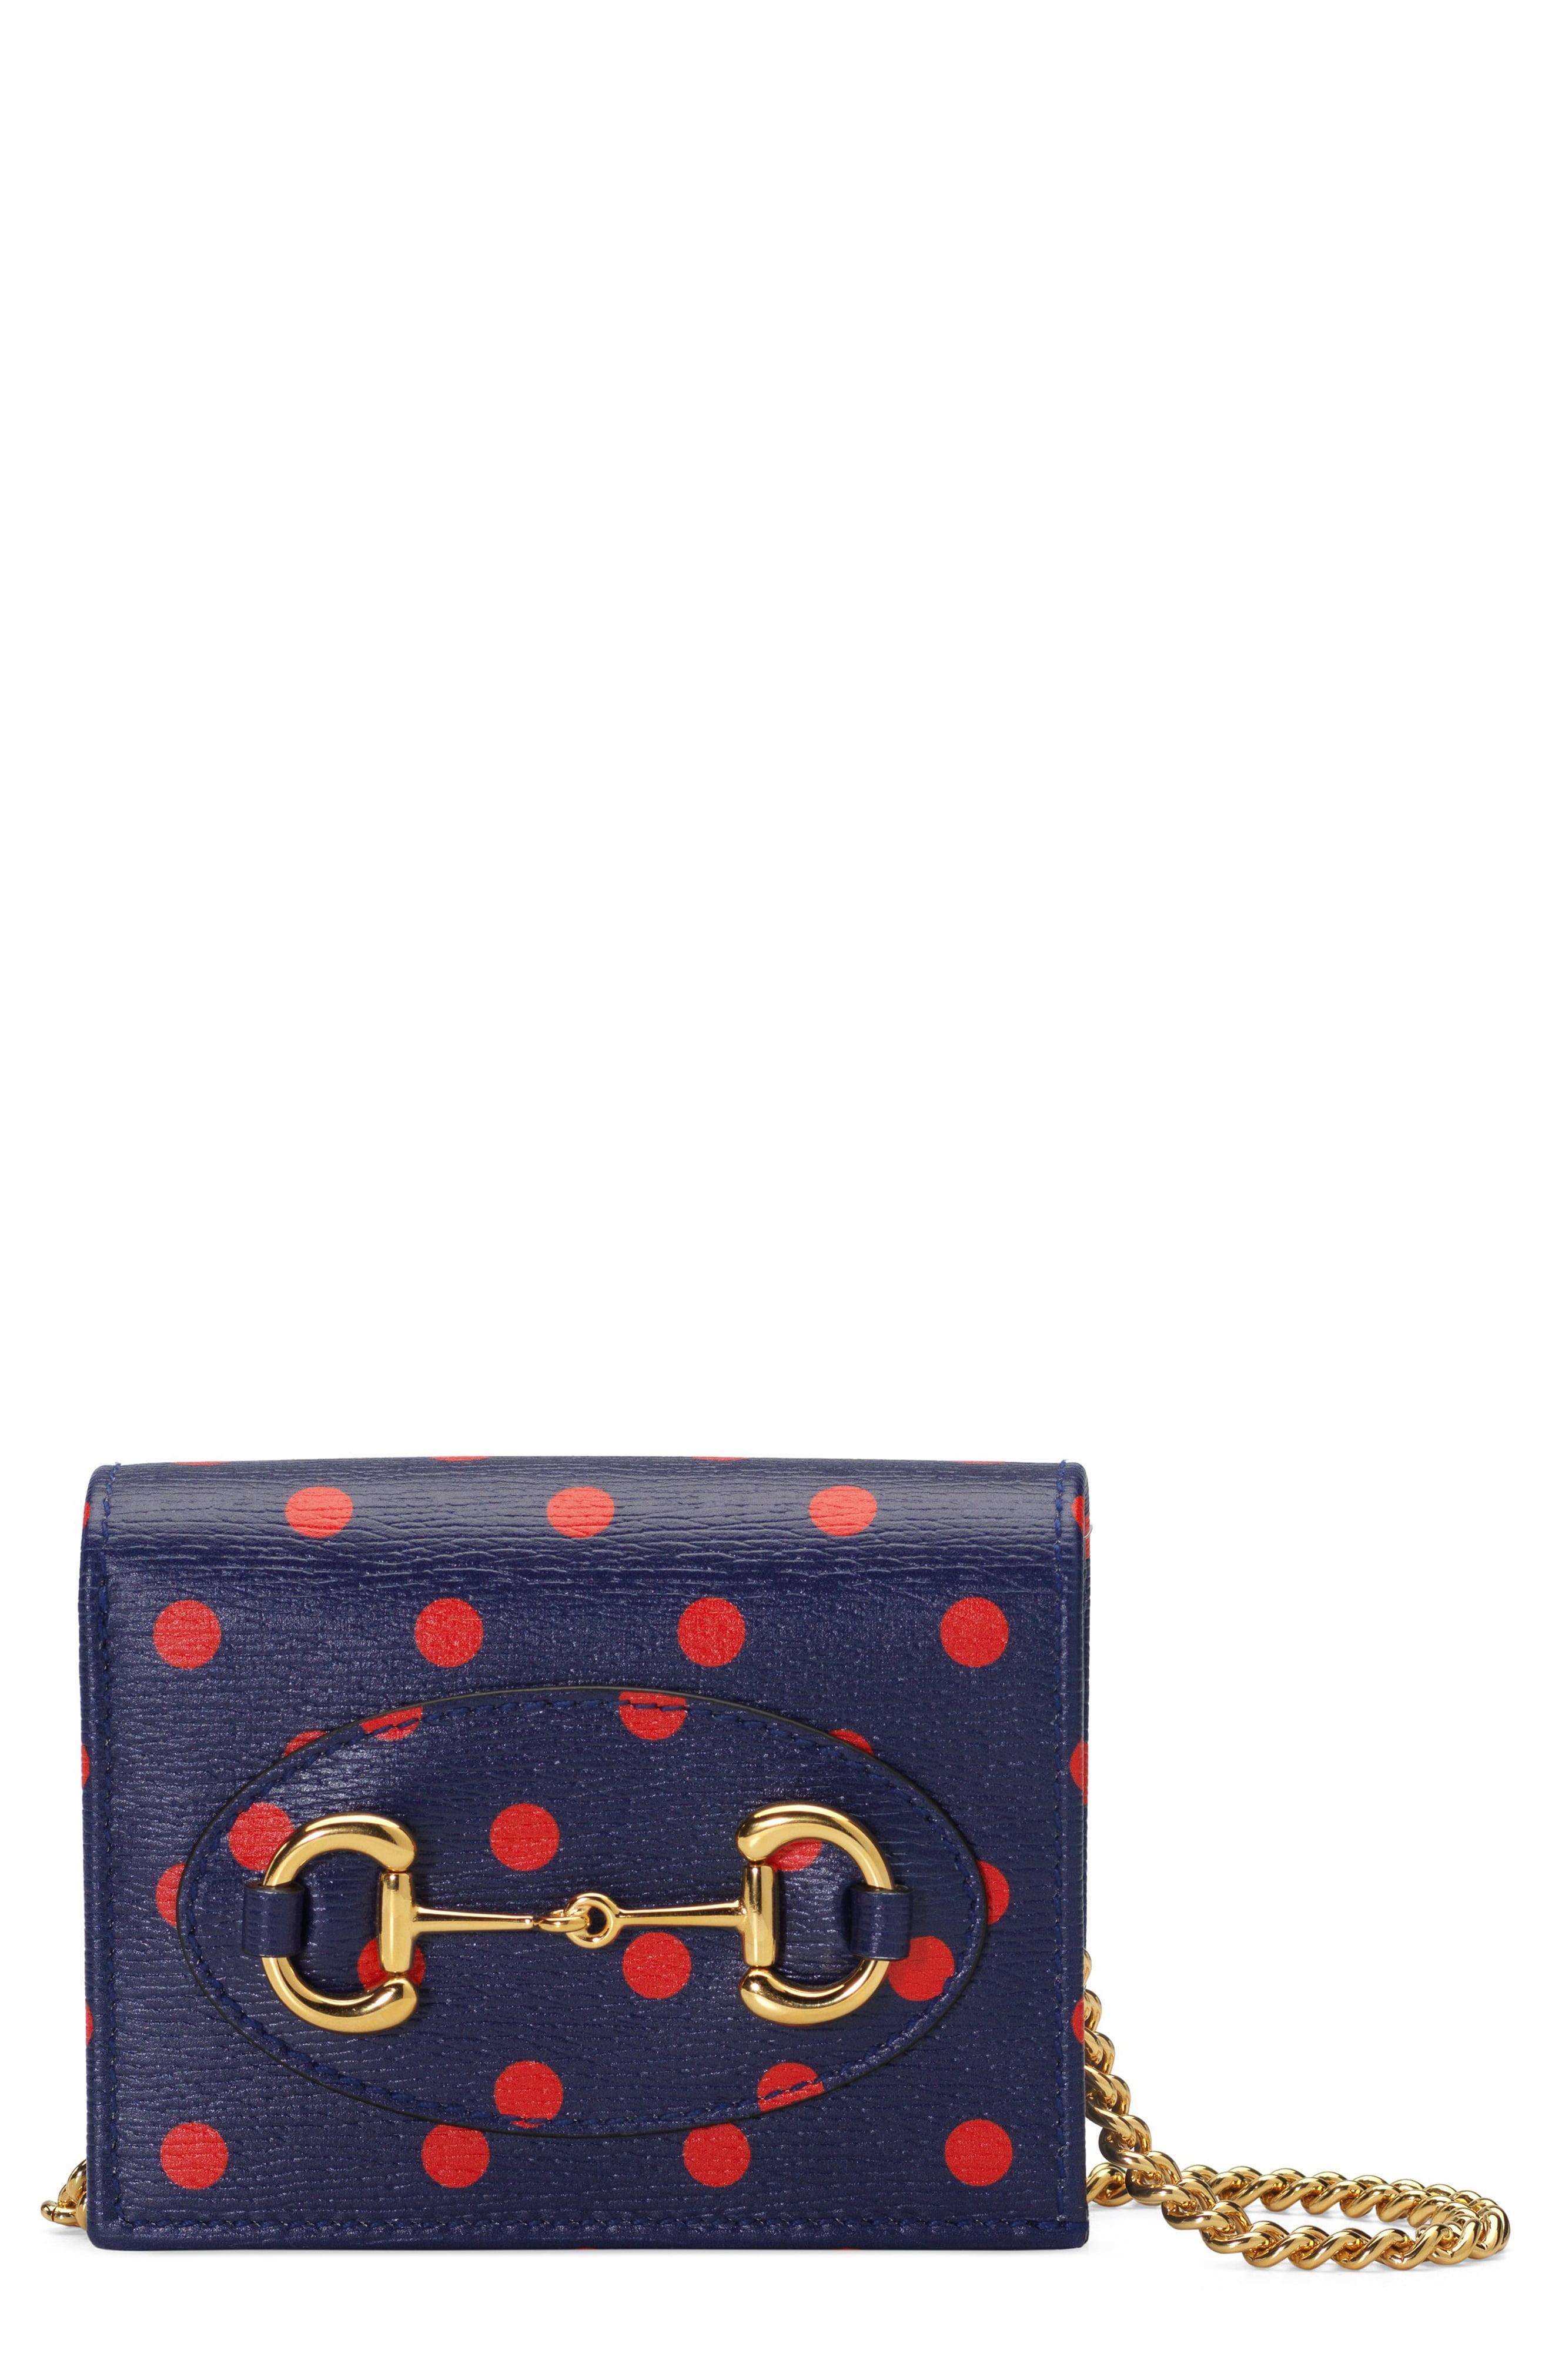 GUCCI 1955 Horsebit Polka Dot Leather Wallet on a Chain, Main, color, BLUE/ ORANGE